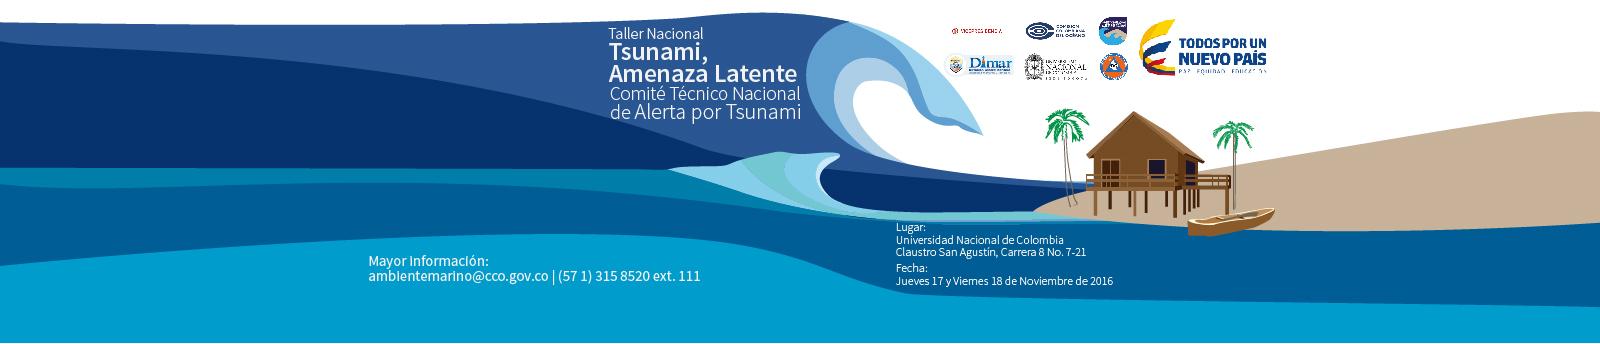 II Taller Nacional Tsunami Amenaza Latente CCO 2016